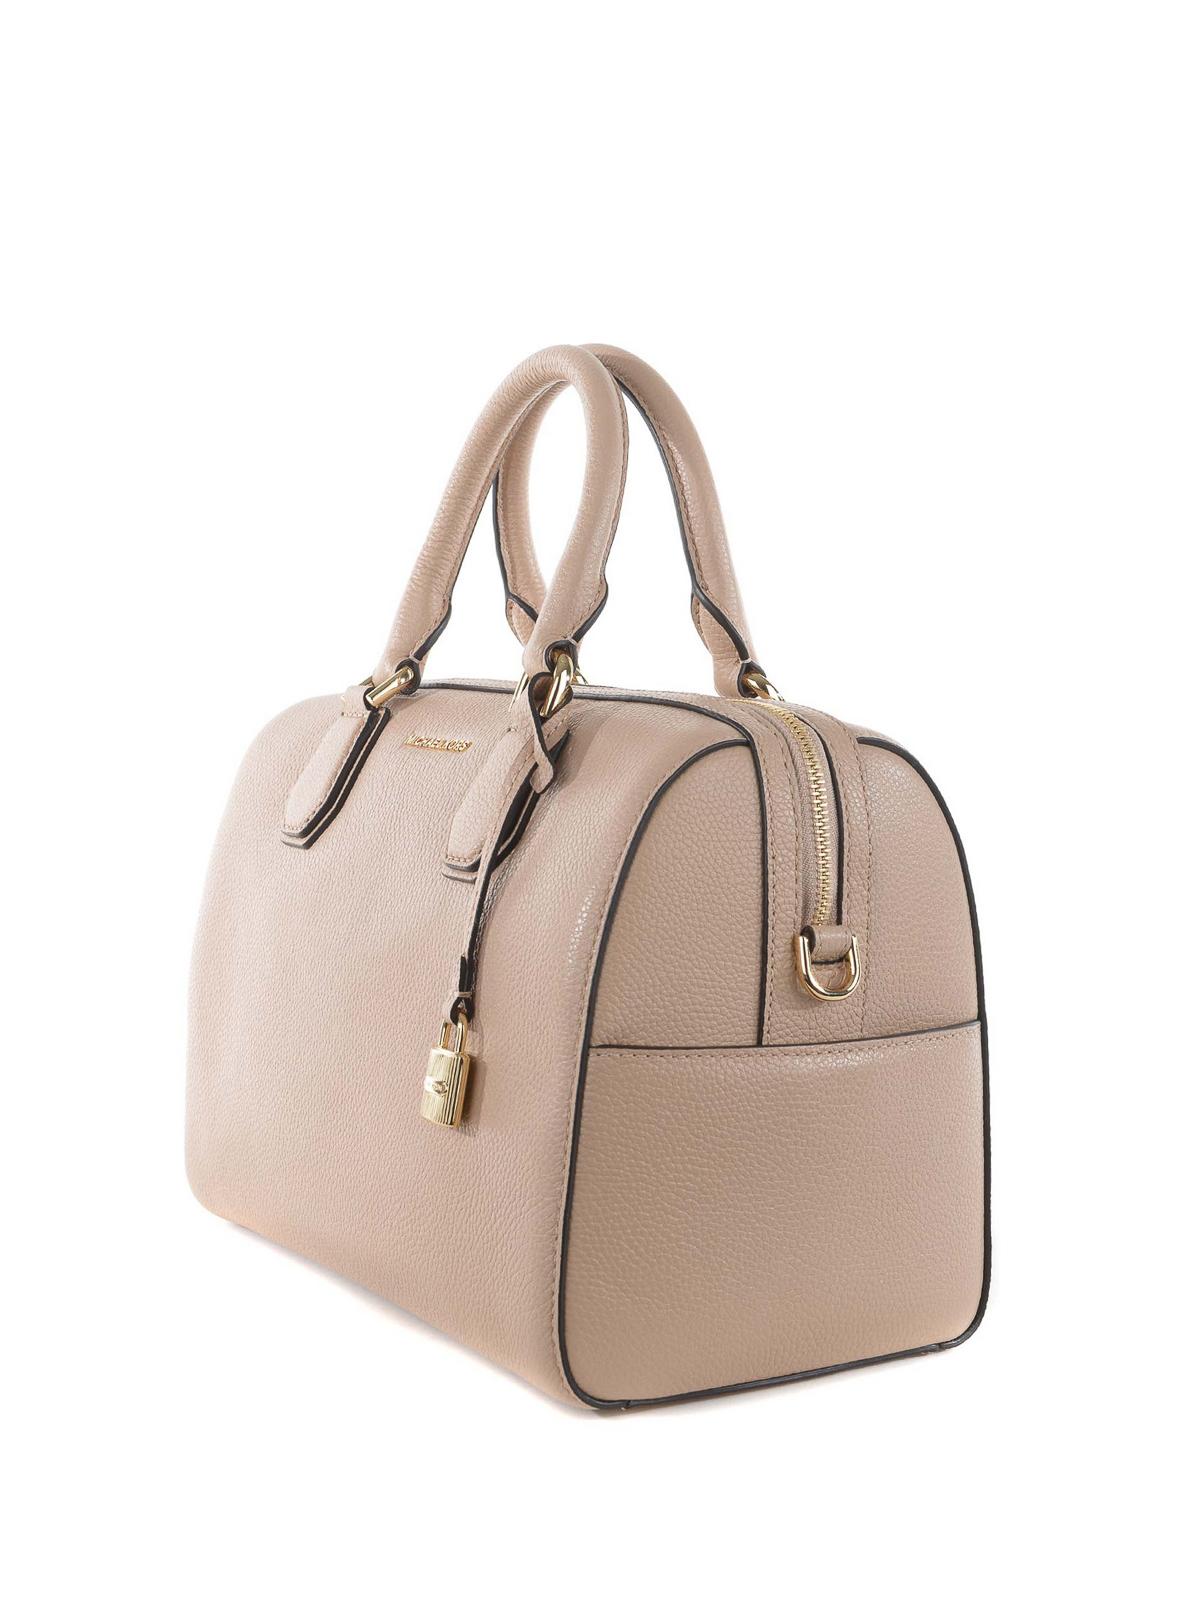 27d35f49203584 Michael Kors - Medium Mercer bowling bag - bowling bags - 30H6GM9U2L134